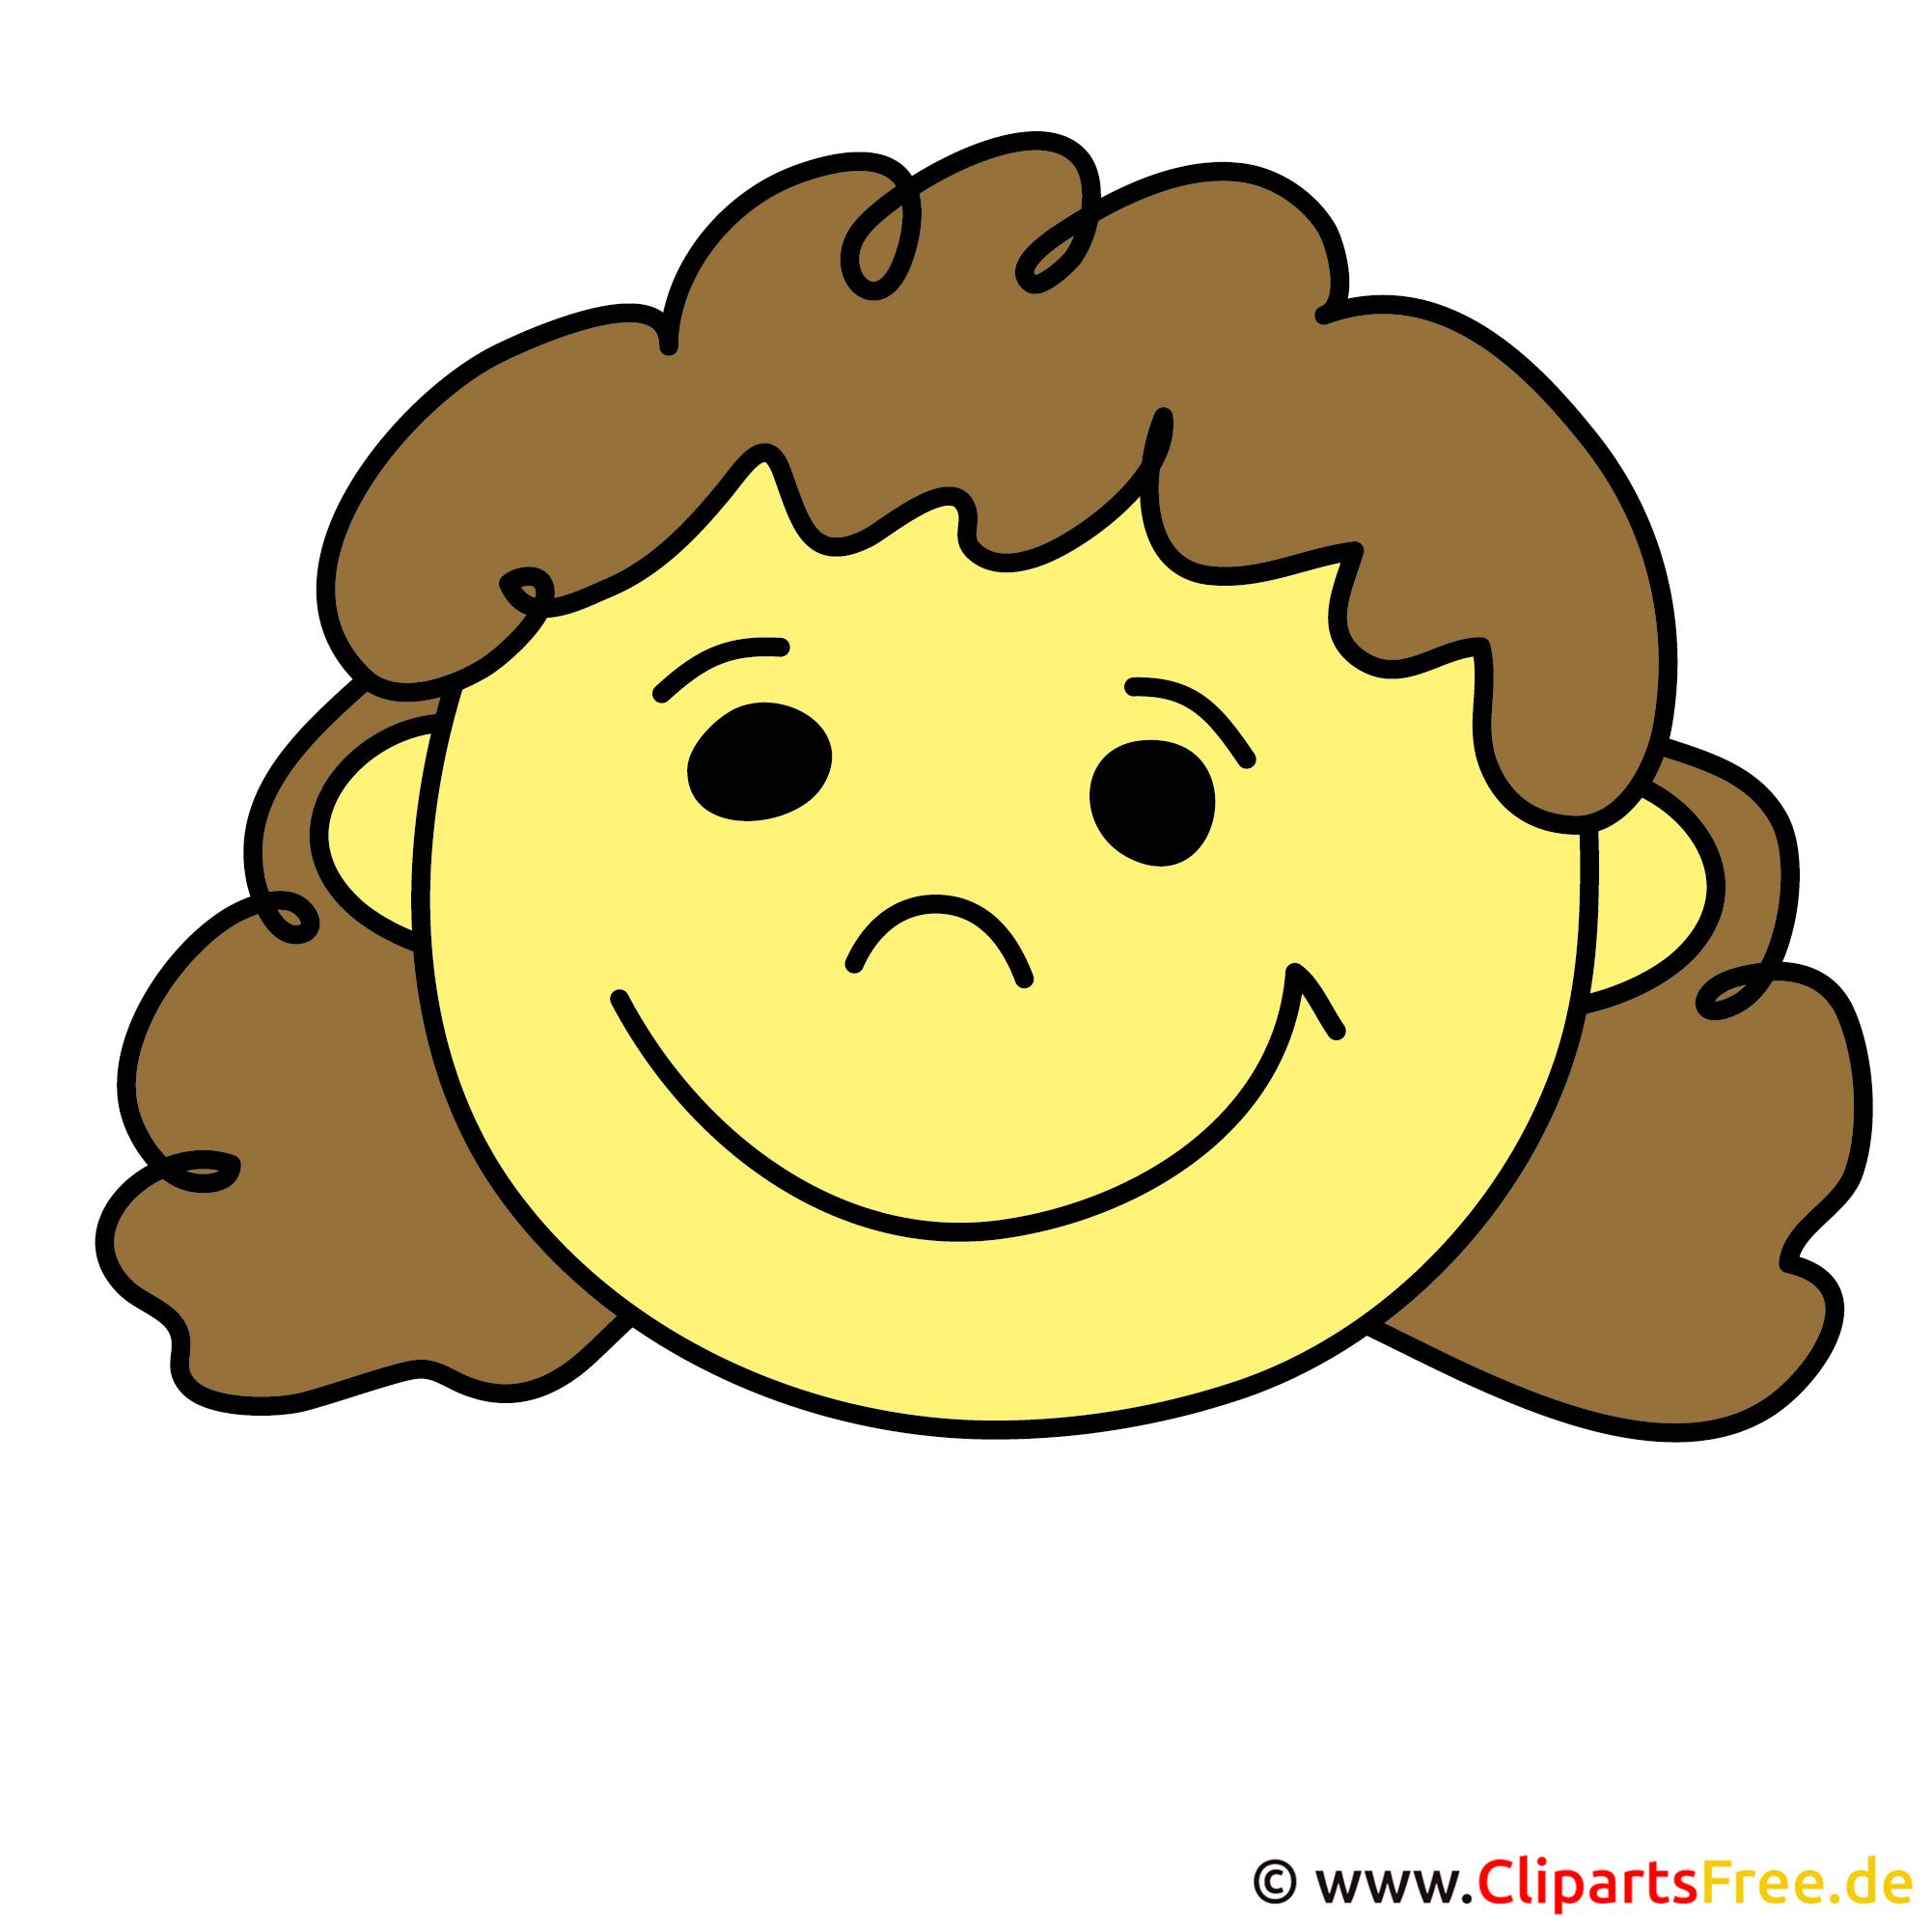 Smile Clipart kostenlos